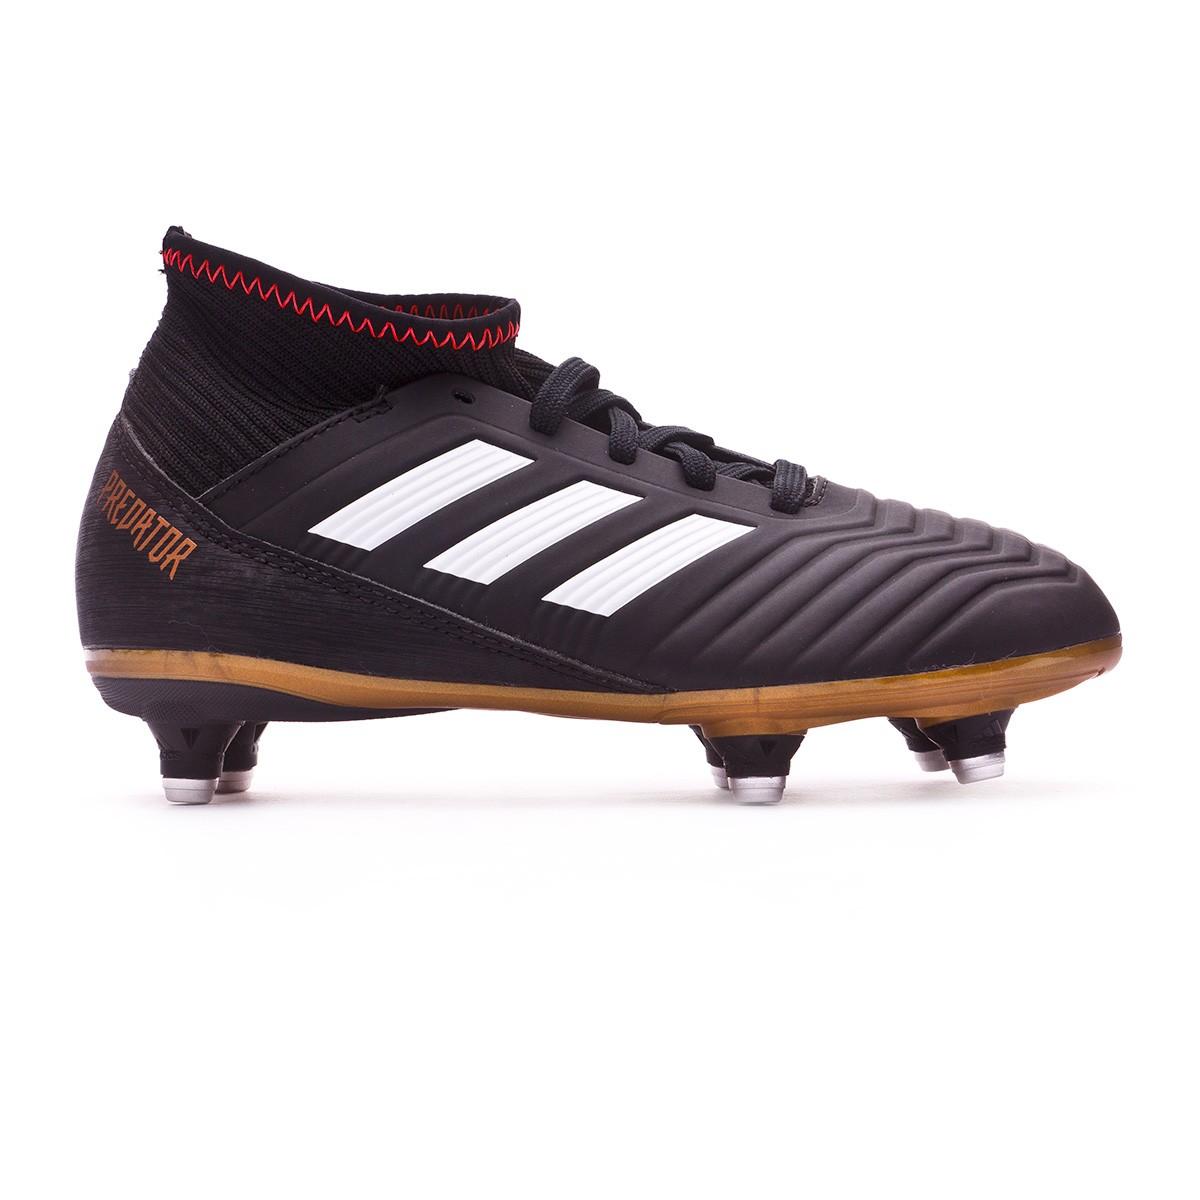 2f88c044f08 Football Boots adidas Kids Predator 18.3 SG Core black-White-Gold  metallic-Solar red - Football store Fútbol Emotion